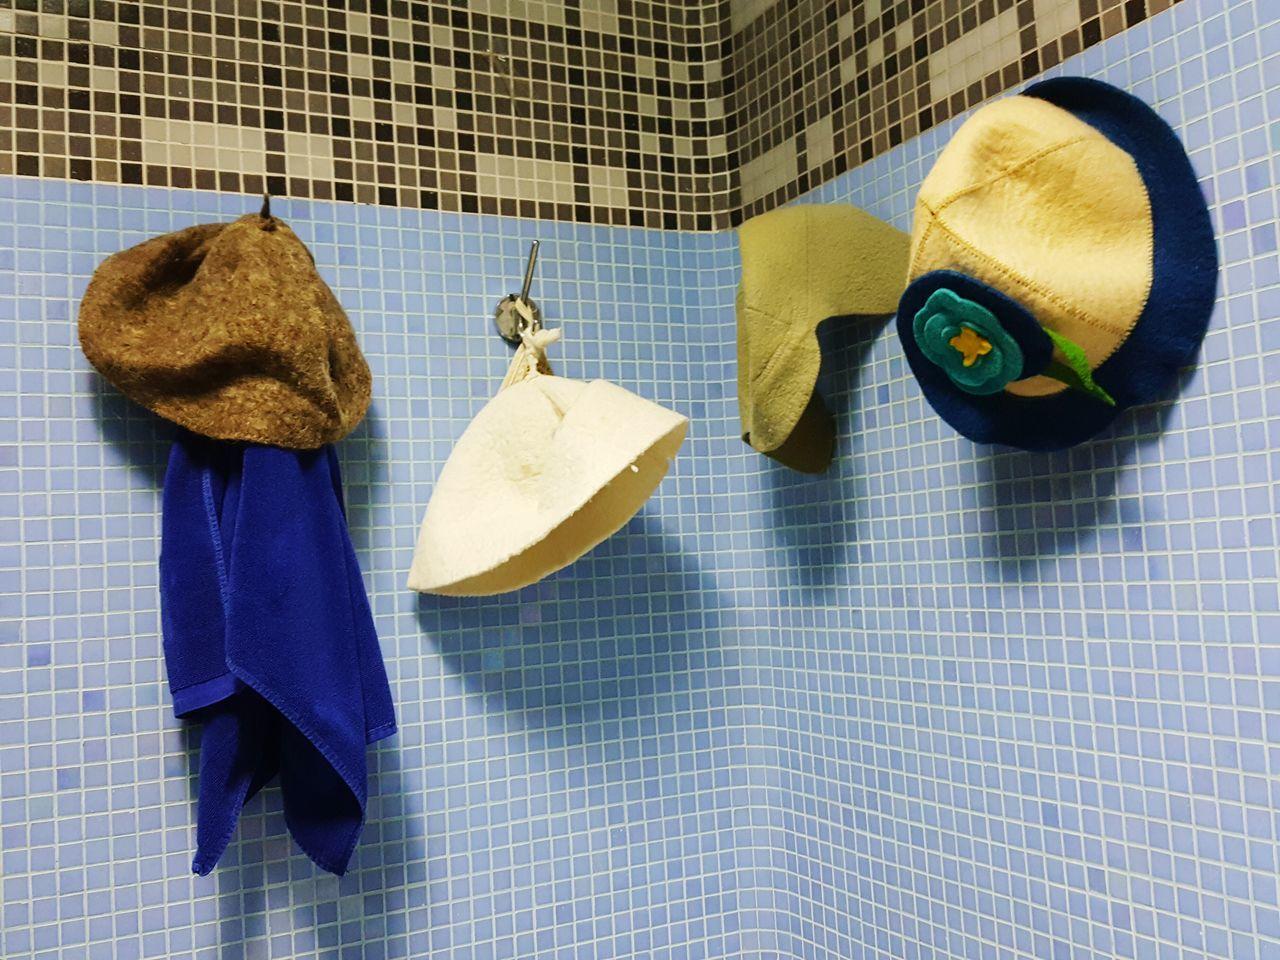 Day No People Outdoors Sauna Bath Hats